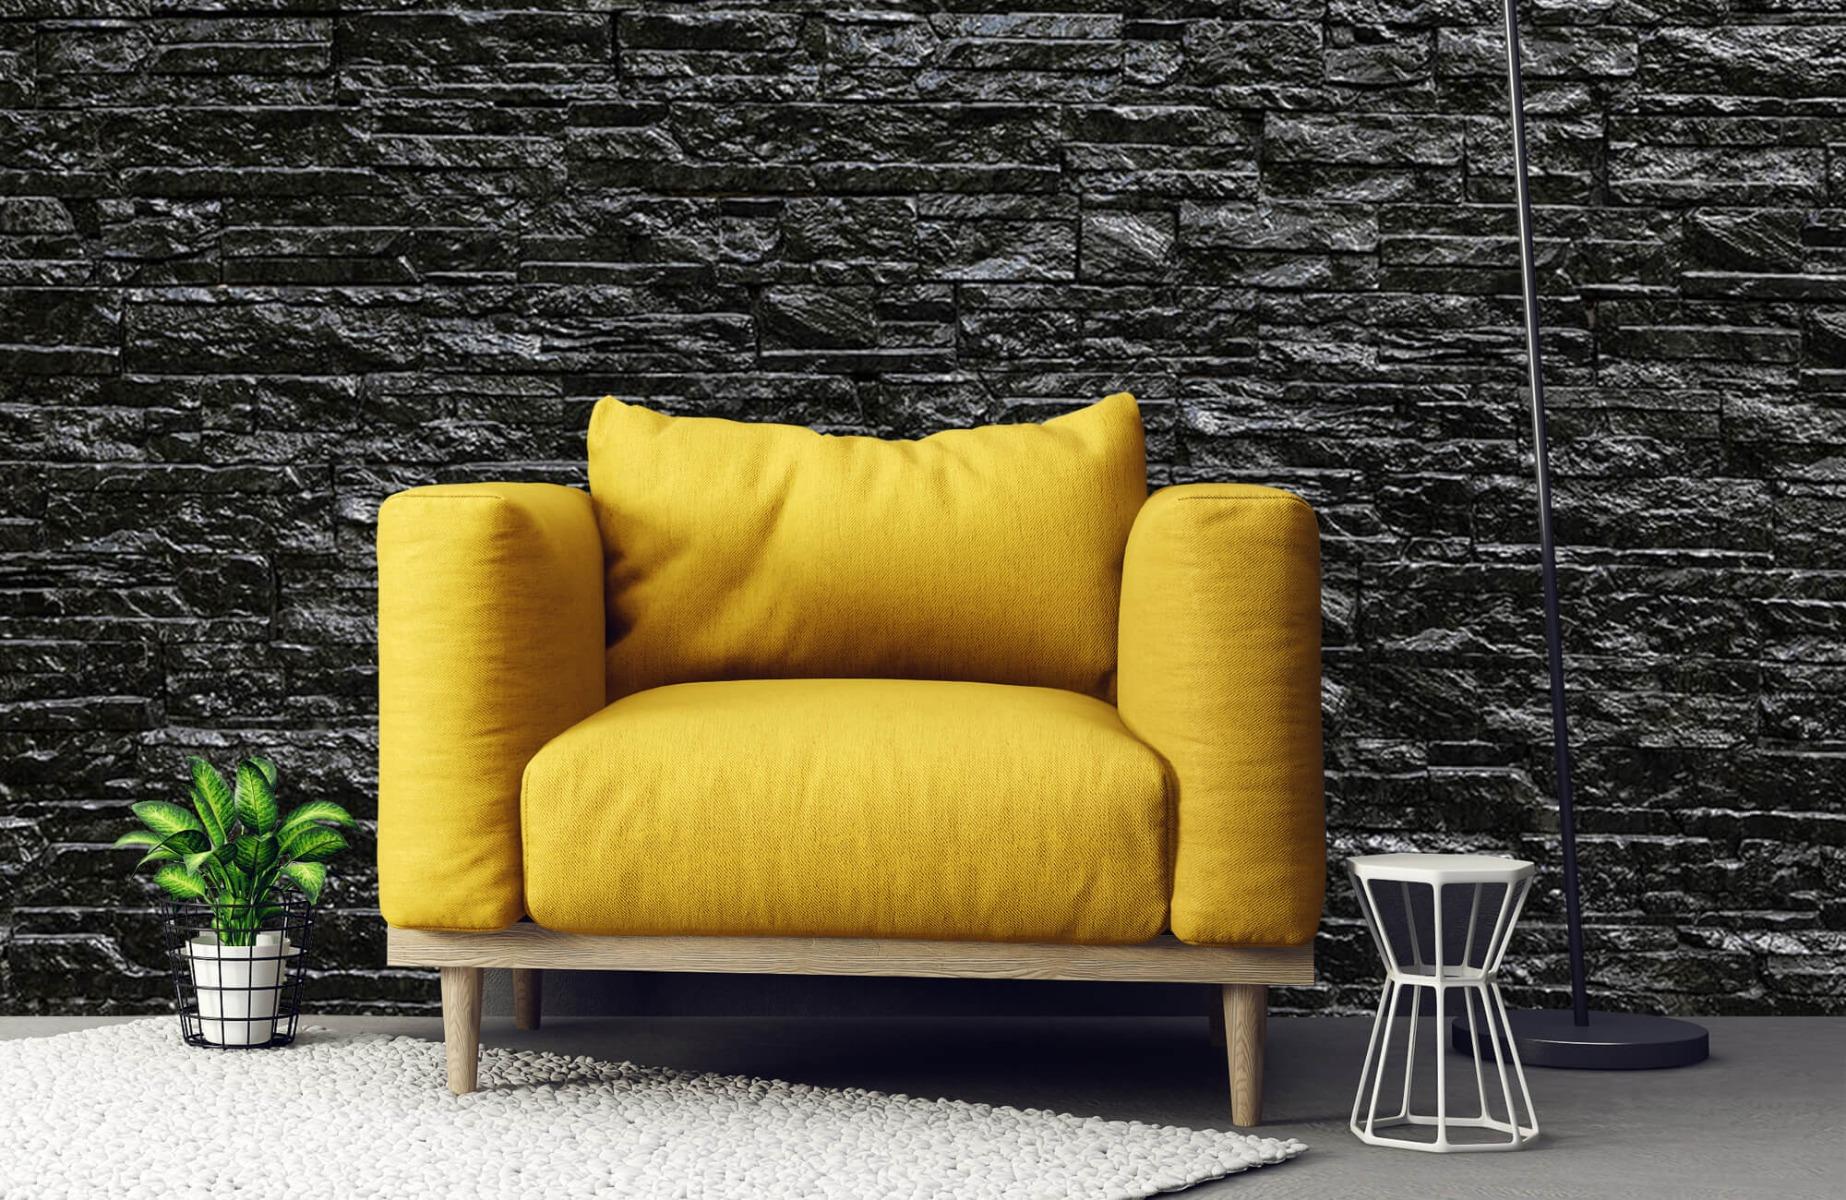 Steen behang - Zwarte stenen - Slaapkamer 21